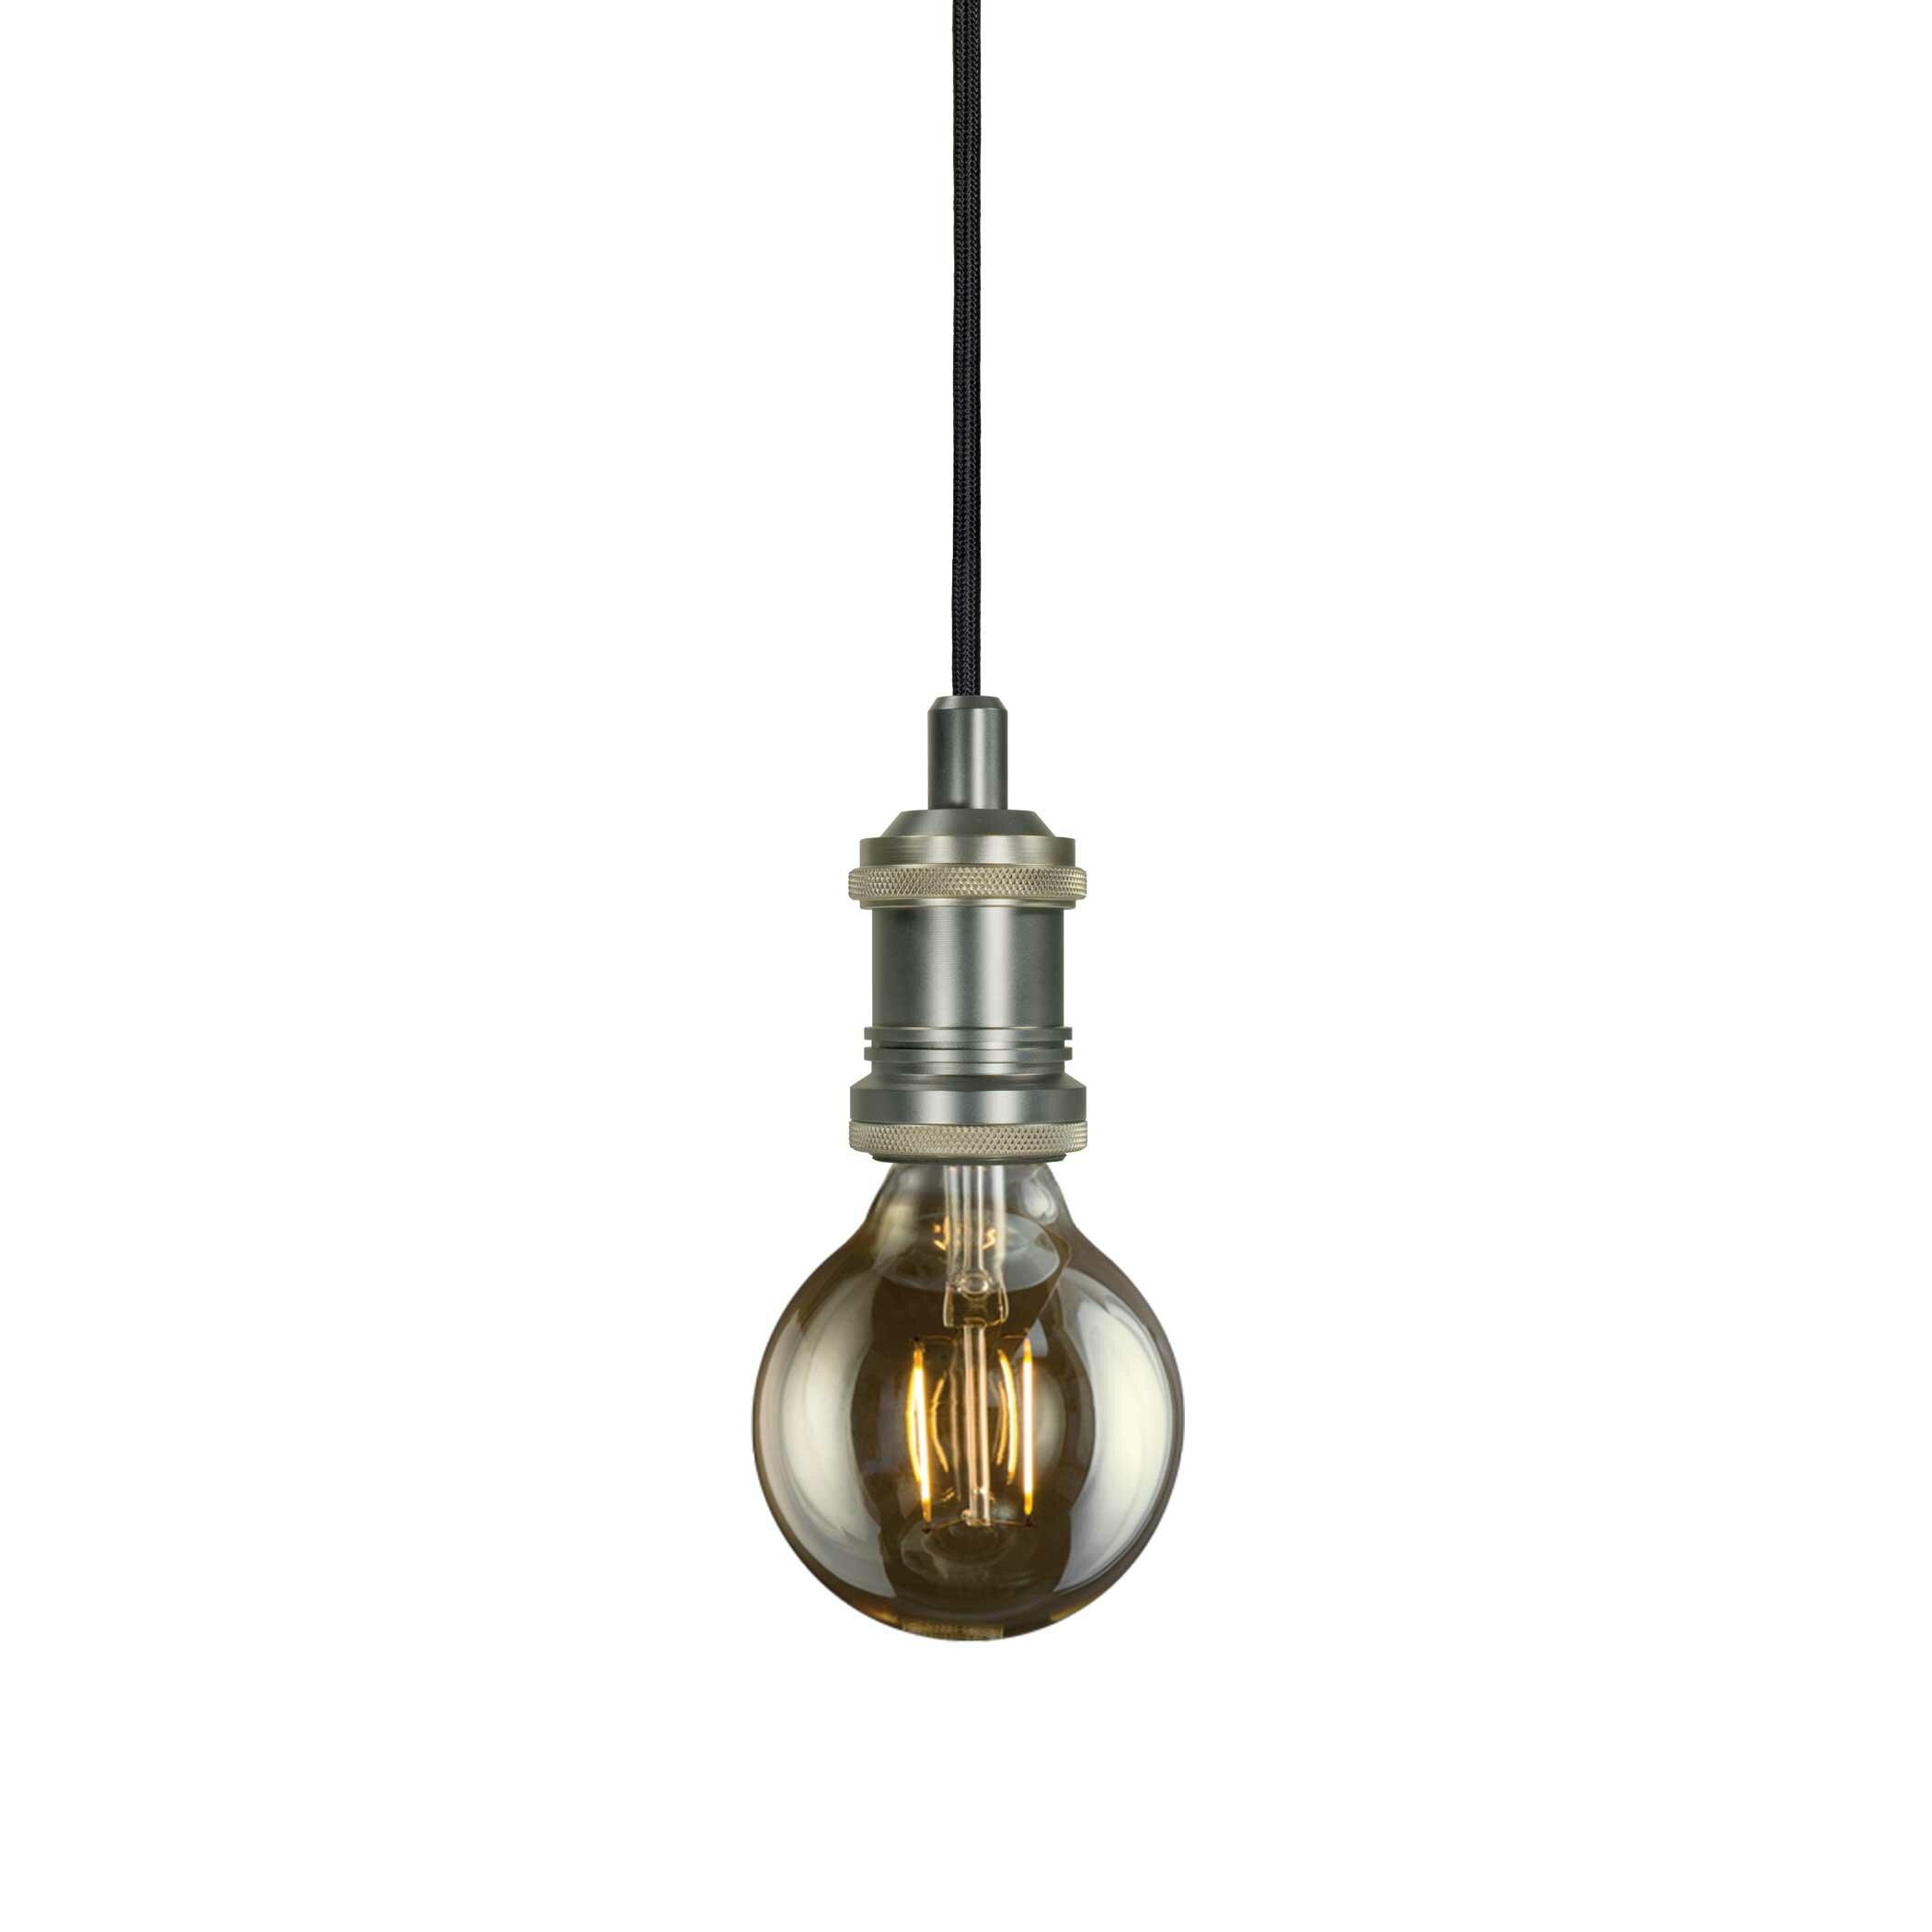 Jesco Lighting Evisage VI 1 Light Mini Pendant